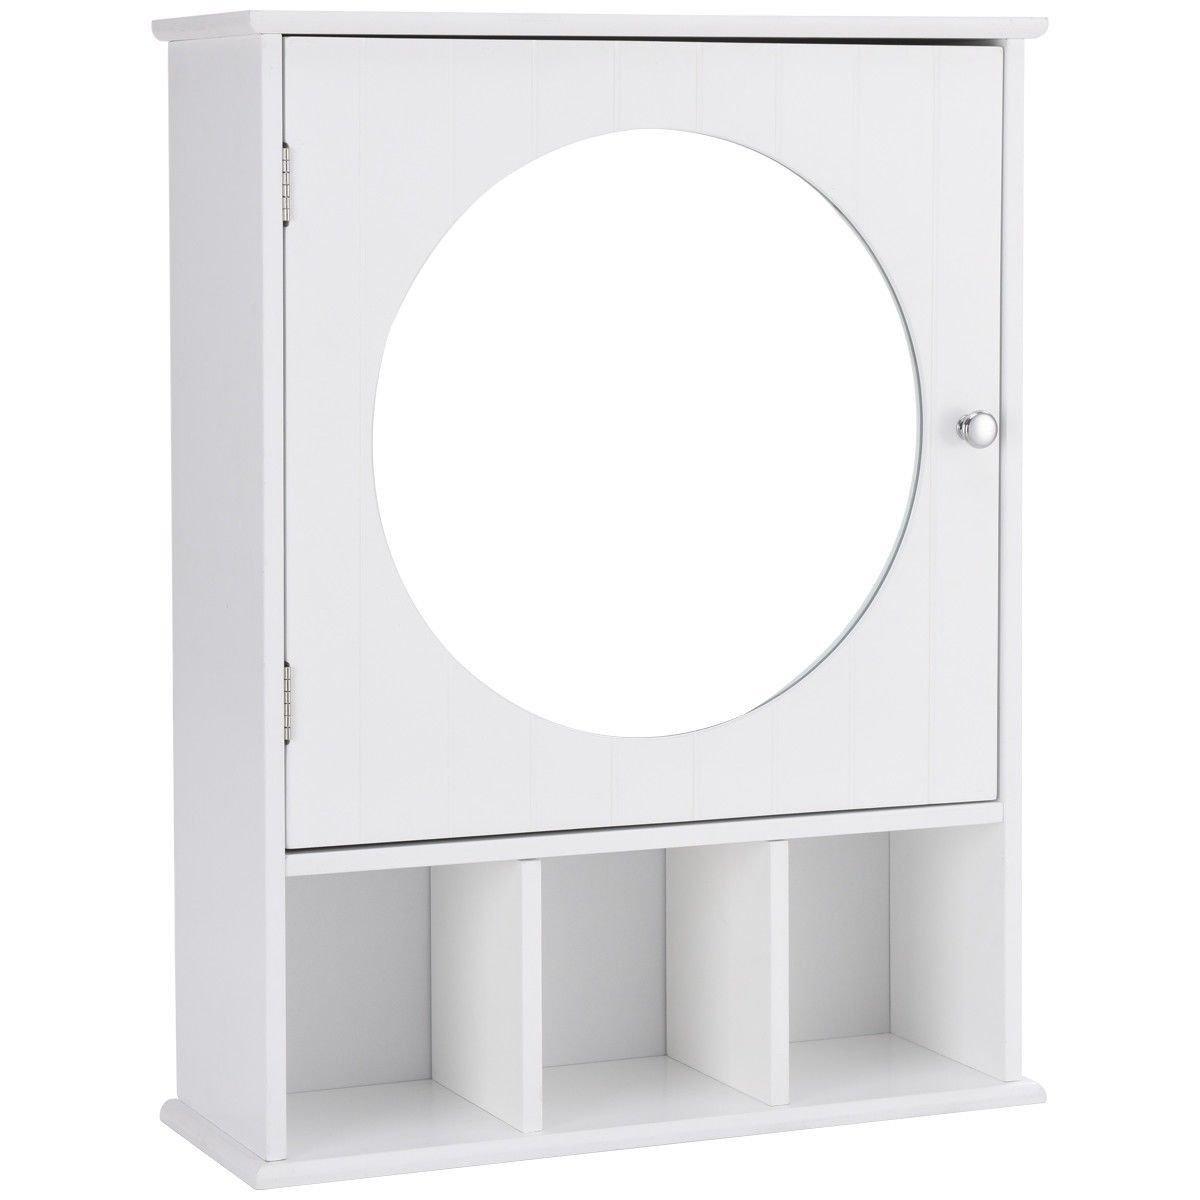 Beenaspiring Bathroom Wooden Wall Mount Storage Organizer Shelf Mirror Door Cabinet Sideboard